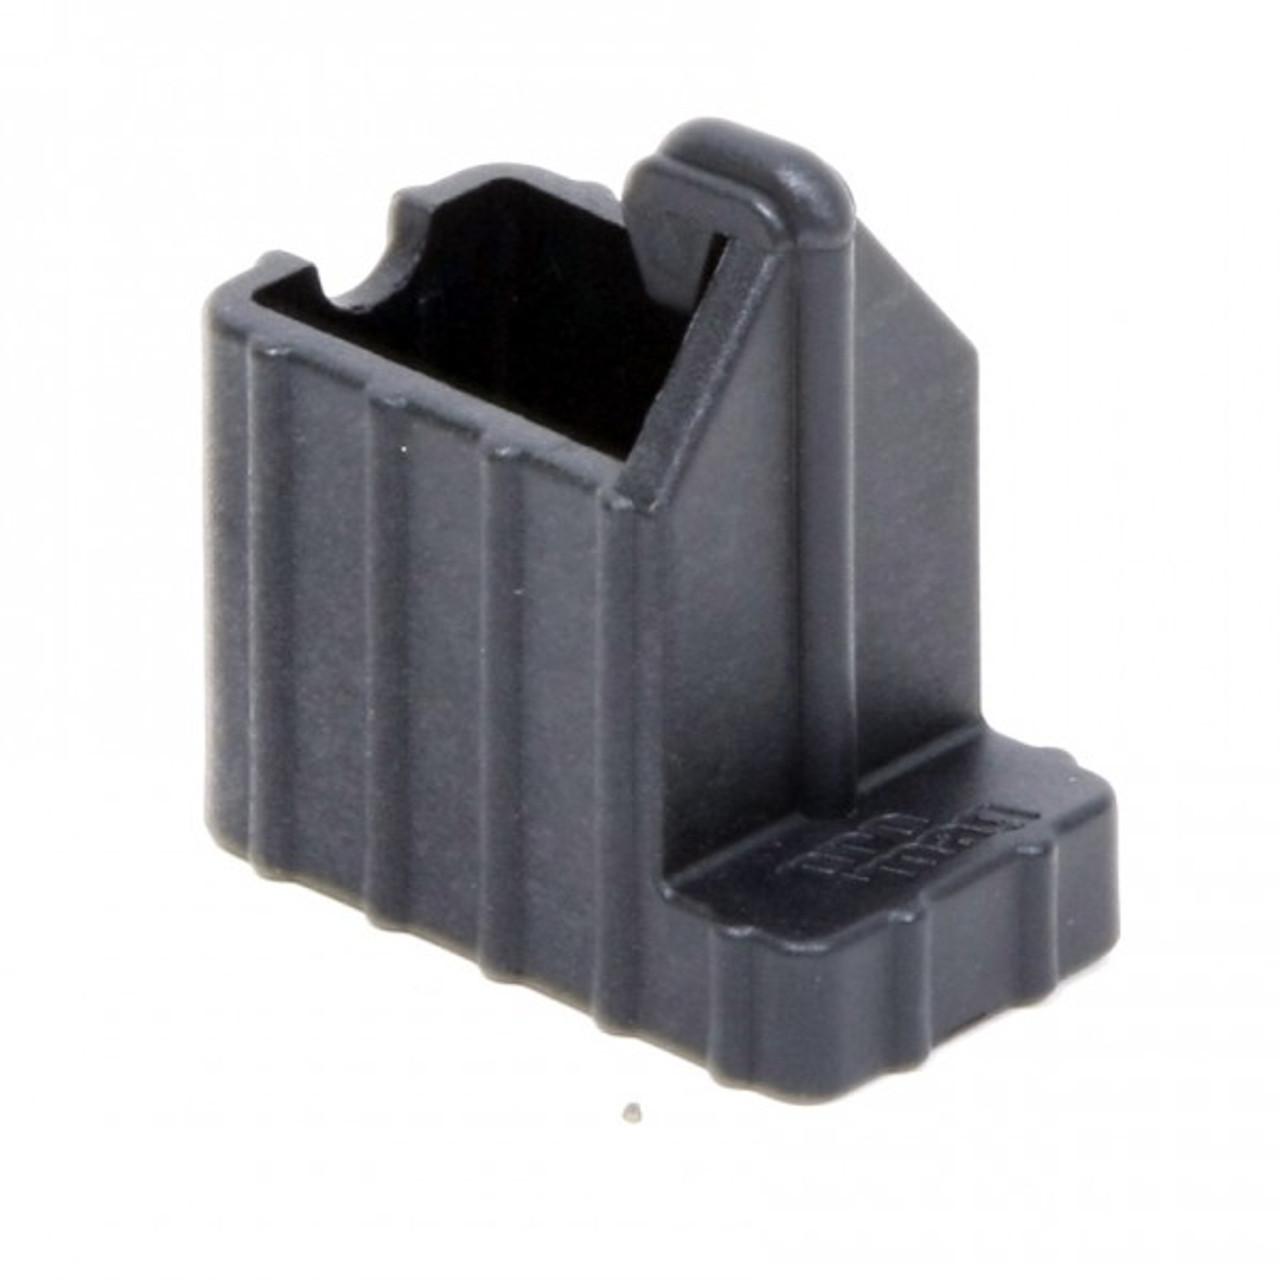 Promag Glock Style 9mm Mag Loader